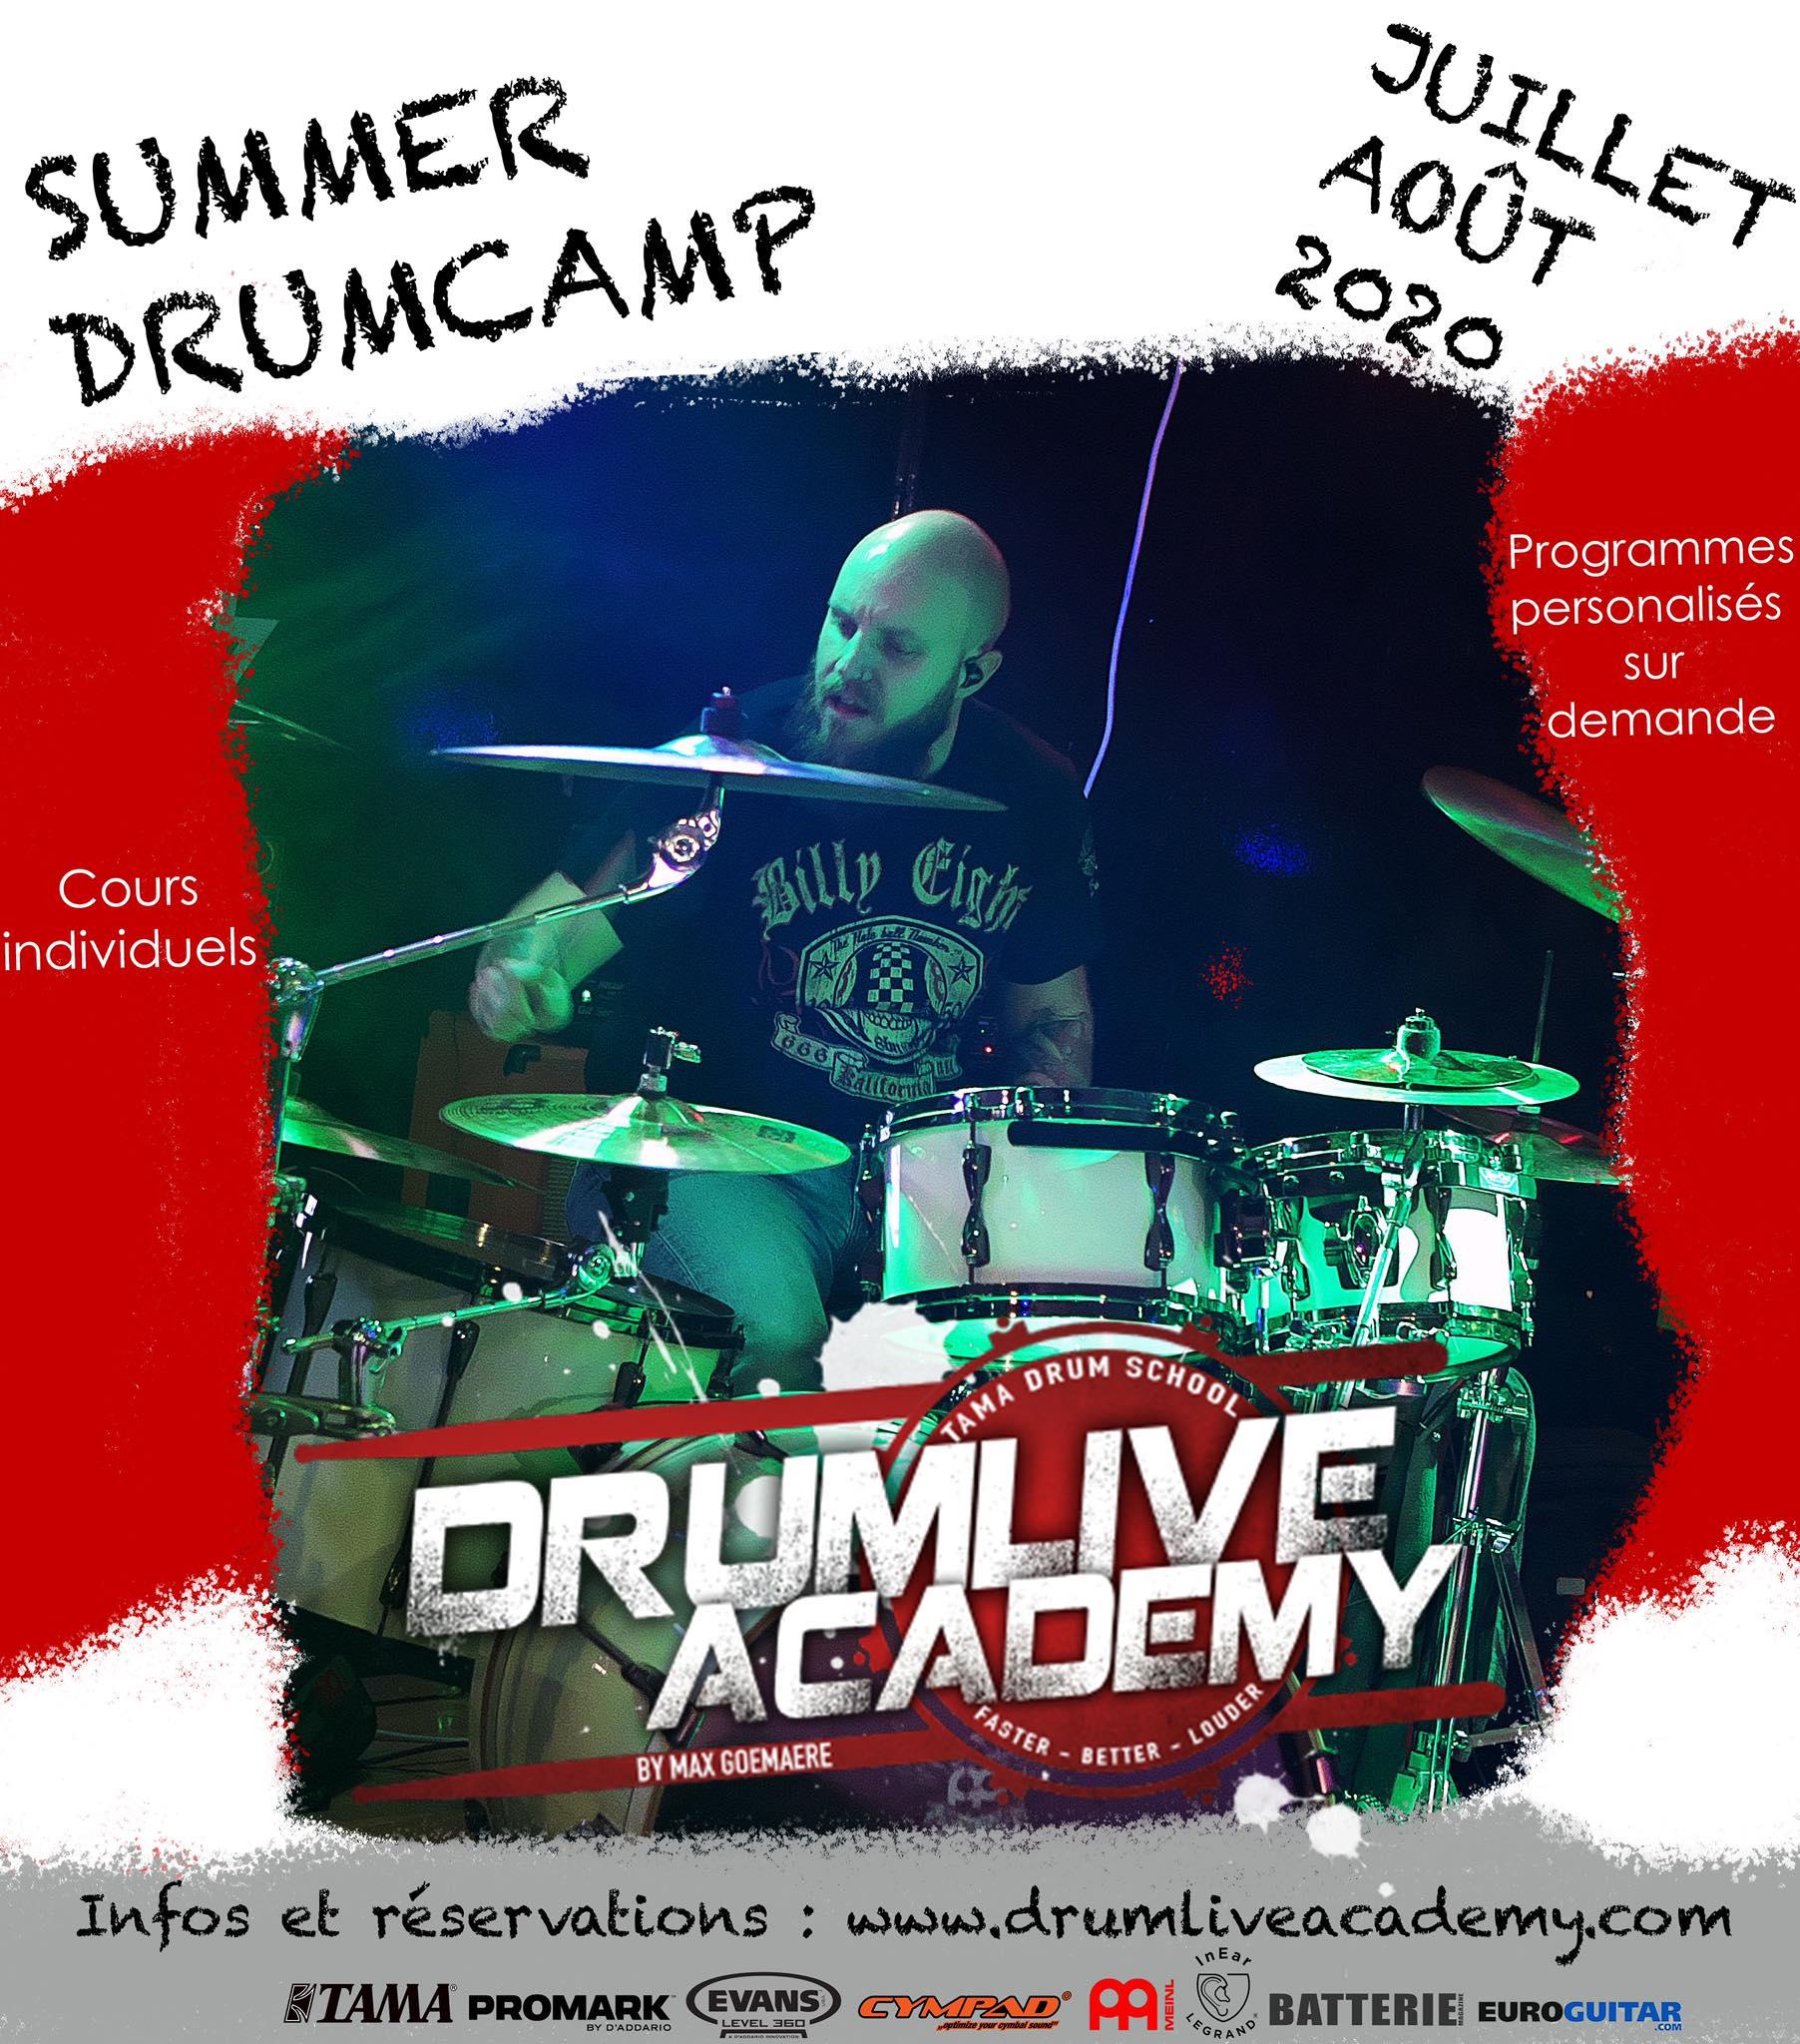 Summer Drum Camp 2020, Stage intensif de batterie, en cours individuels.